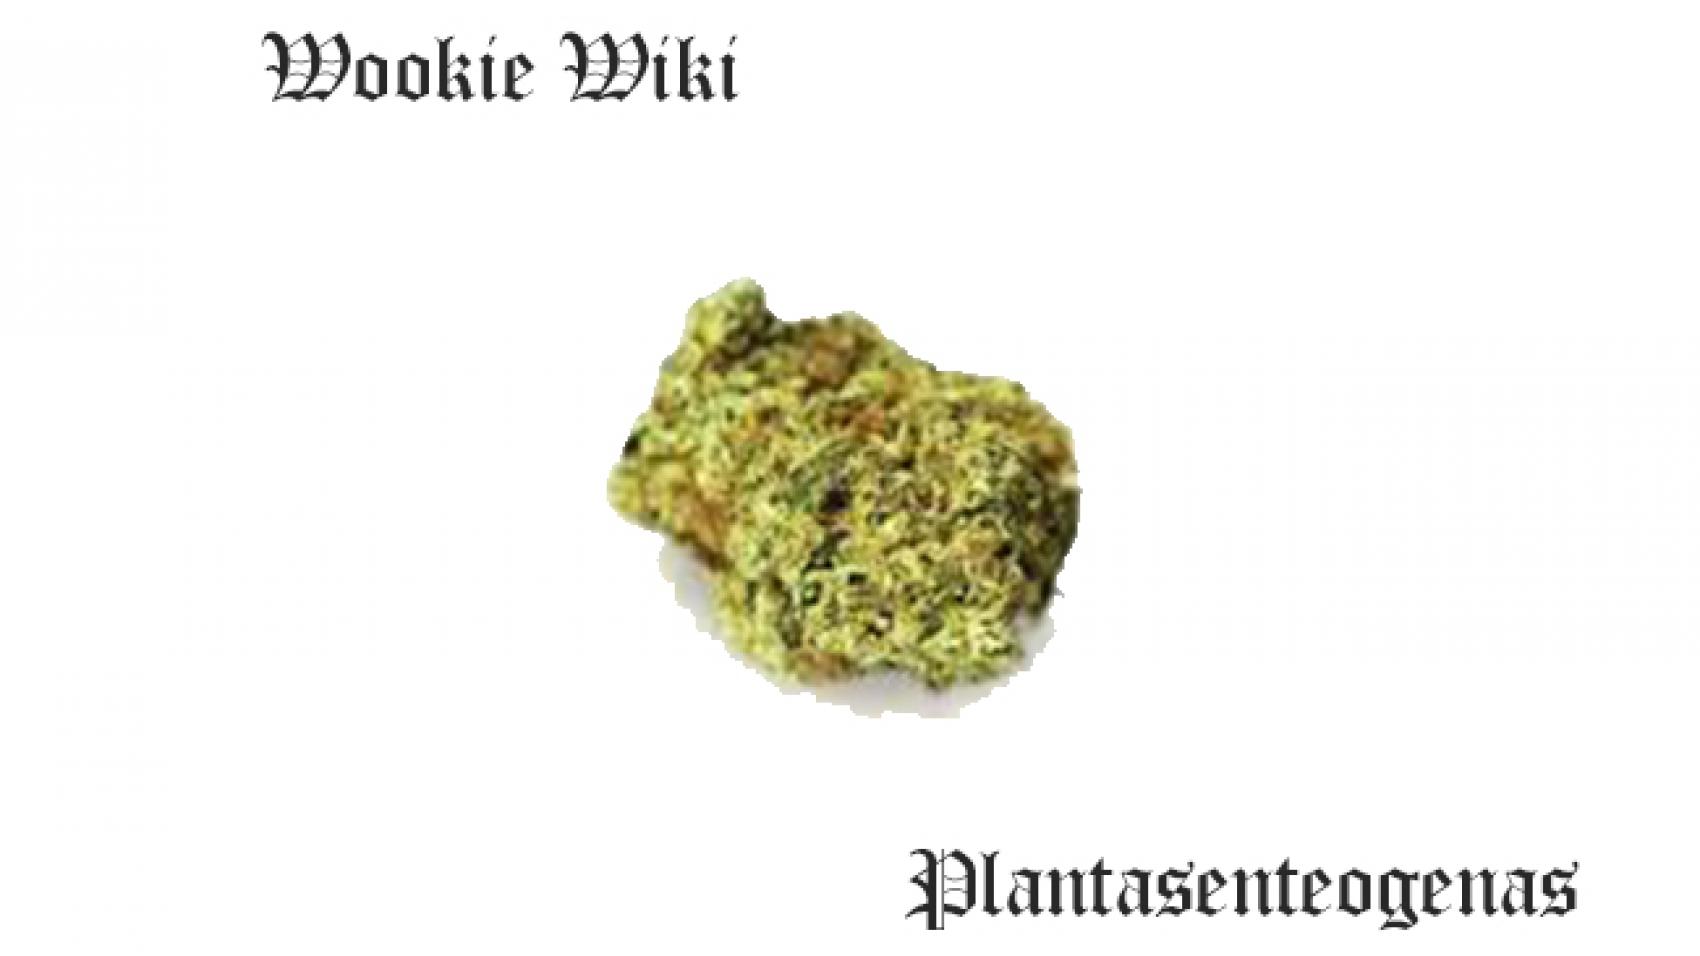 wookie wiki